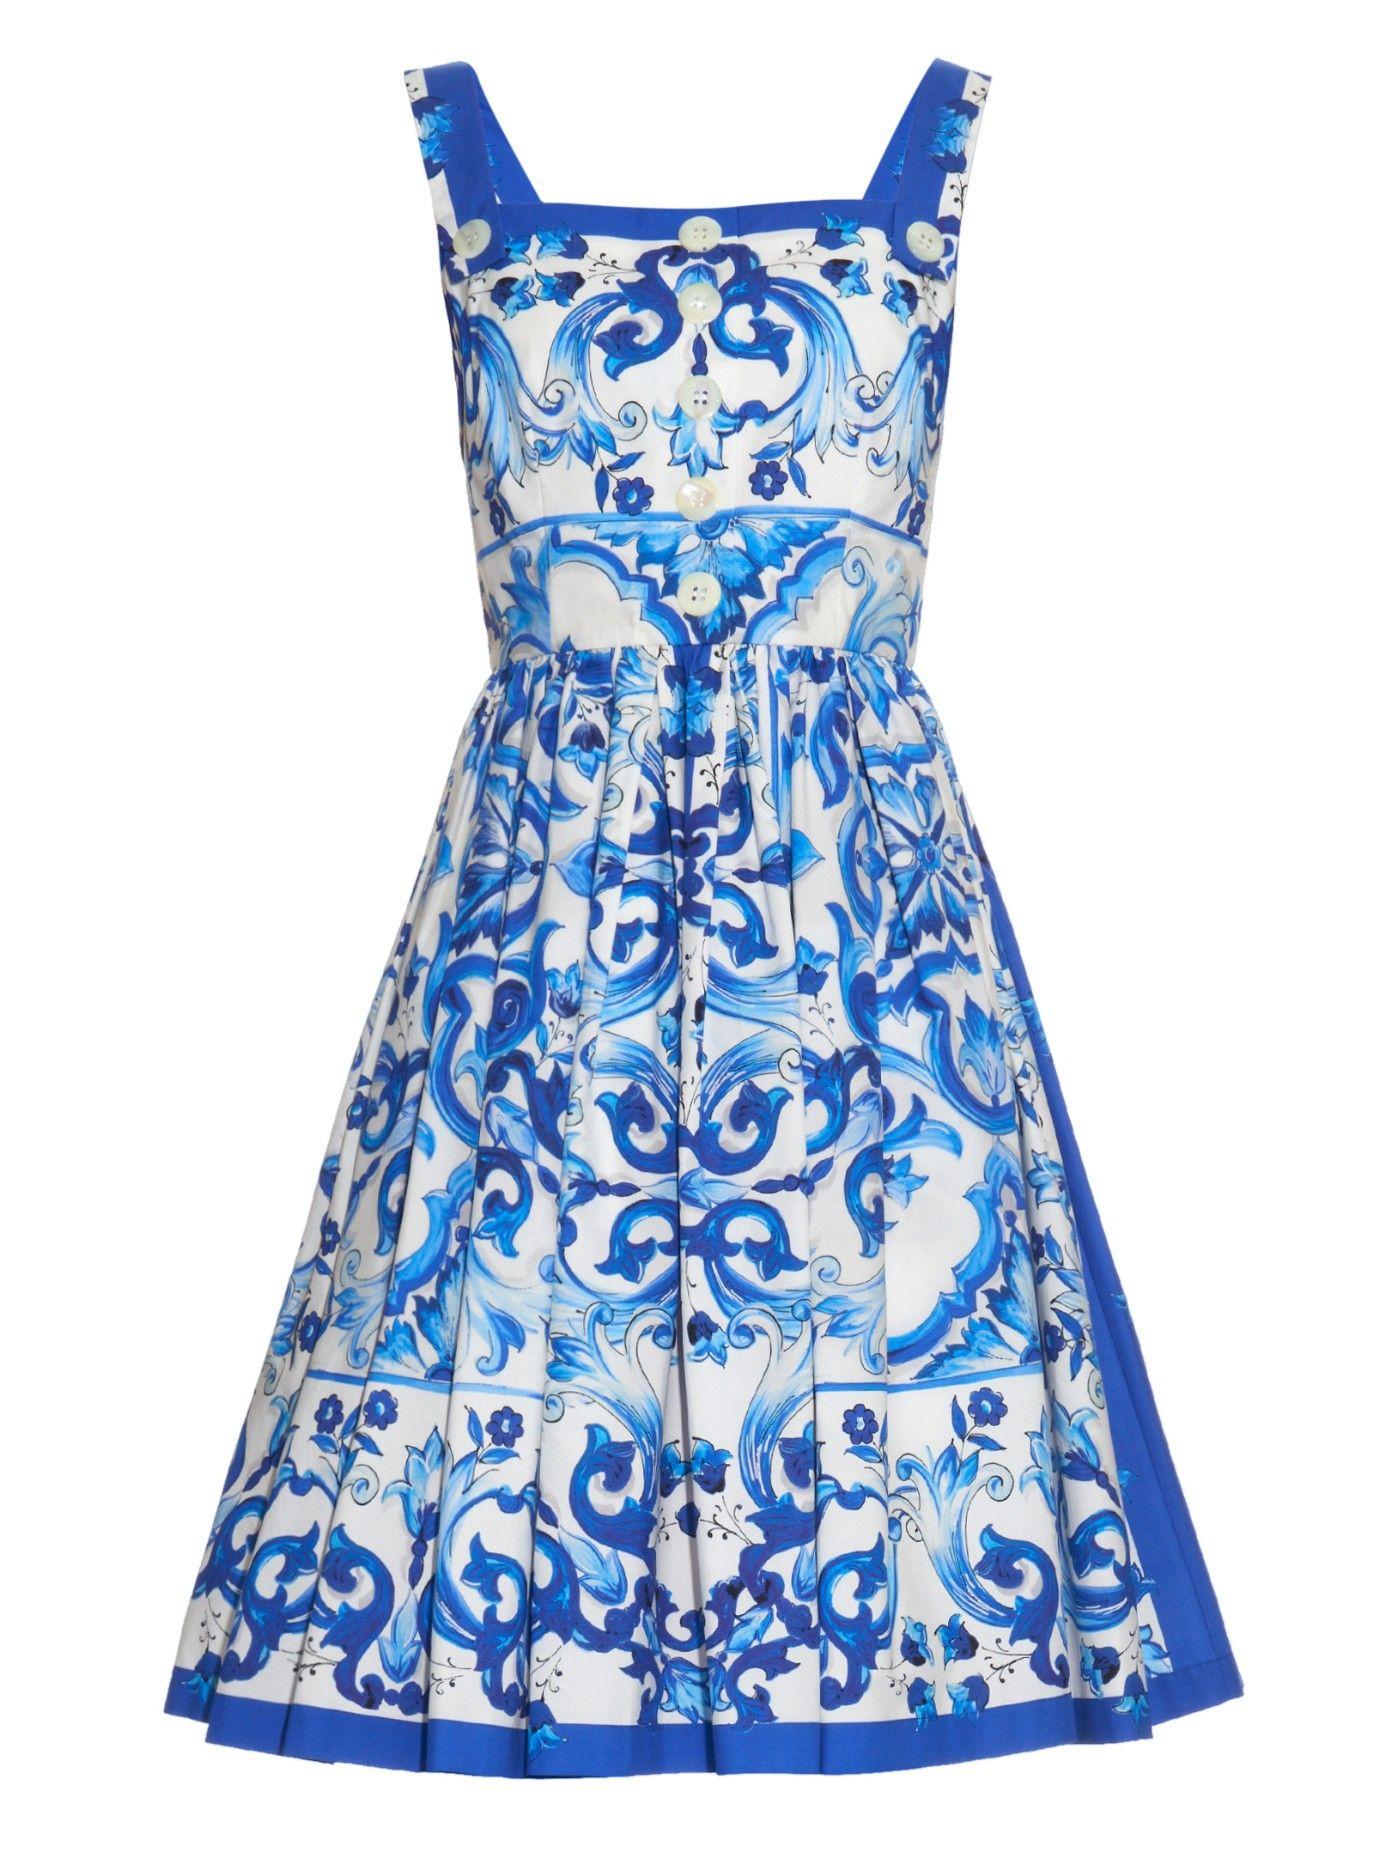 Majolica-print cotton-poplin dress | Dolce & Gabbana | MATCHESFASHION.COM UK